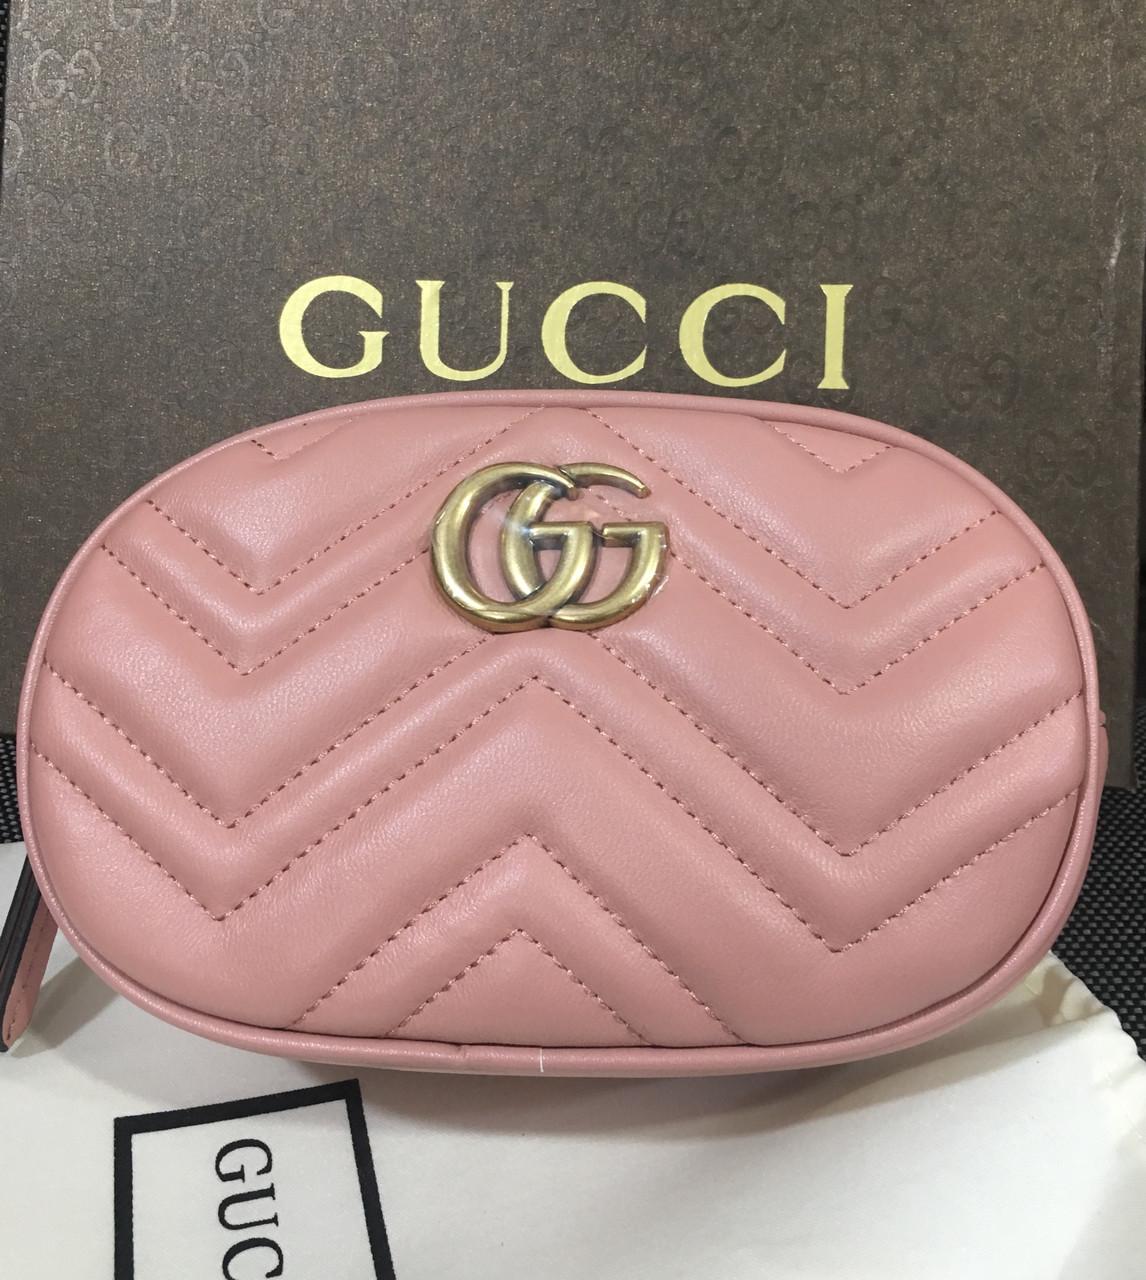 446f4f262618 Сумка поясная (бананка) Gucci (натуральная кожа): продажа, цена в ...